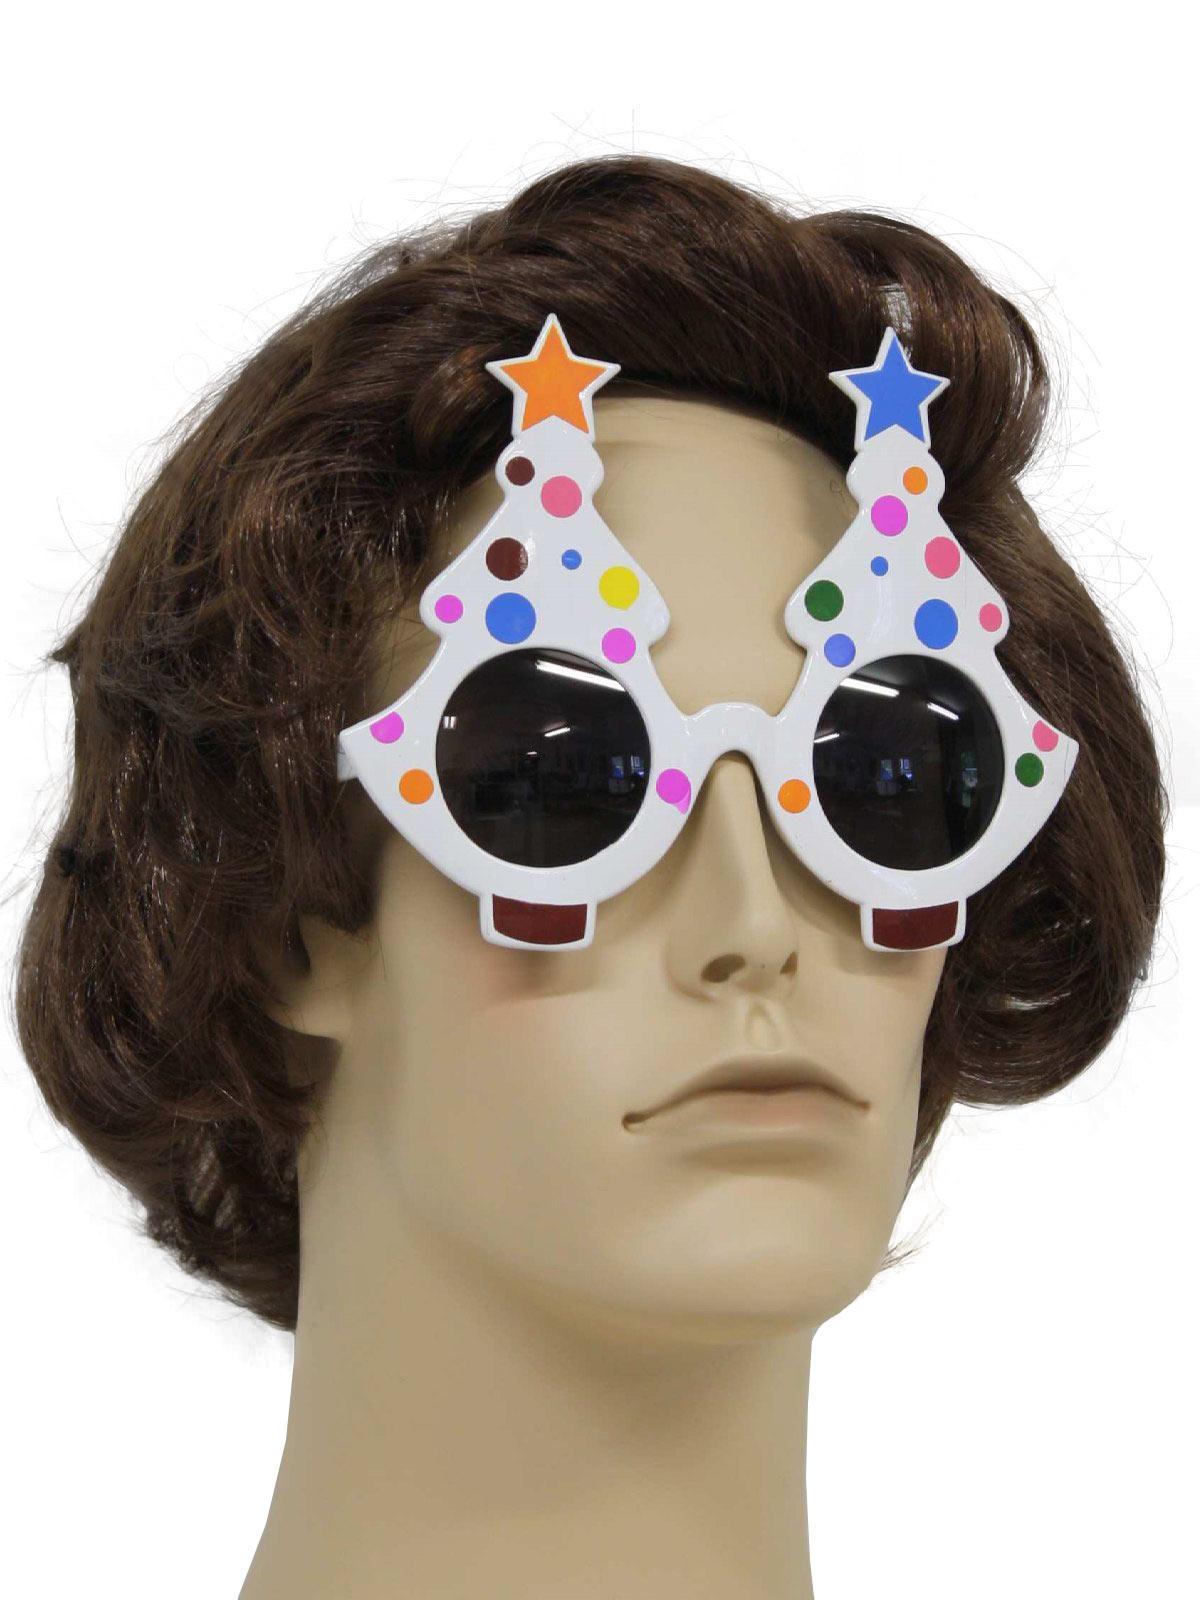 Accessories Polka Dot Christmas Tree Sunglasses To Wear